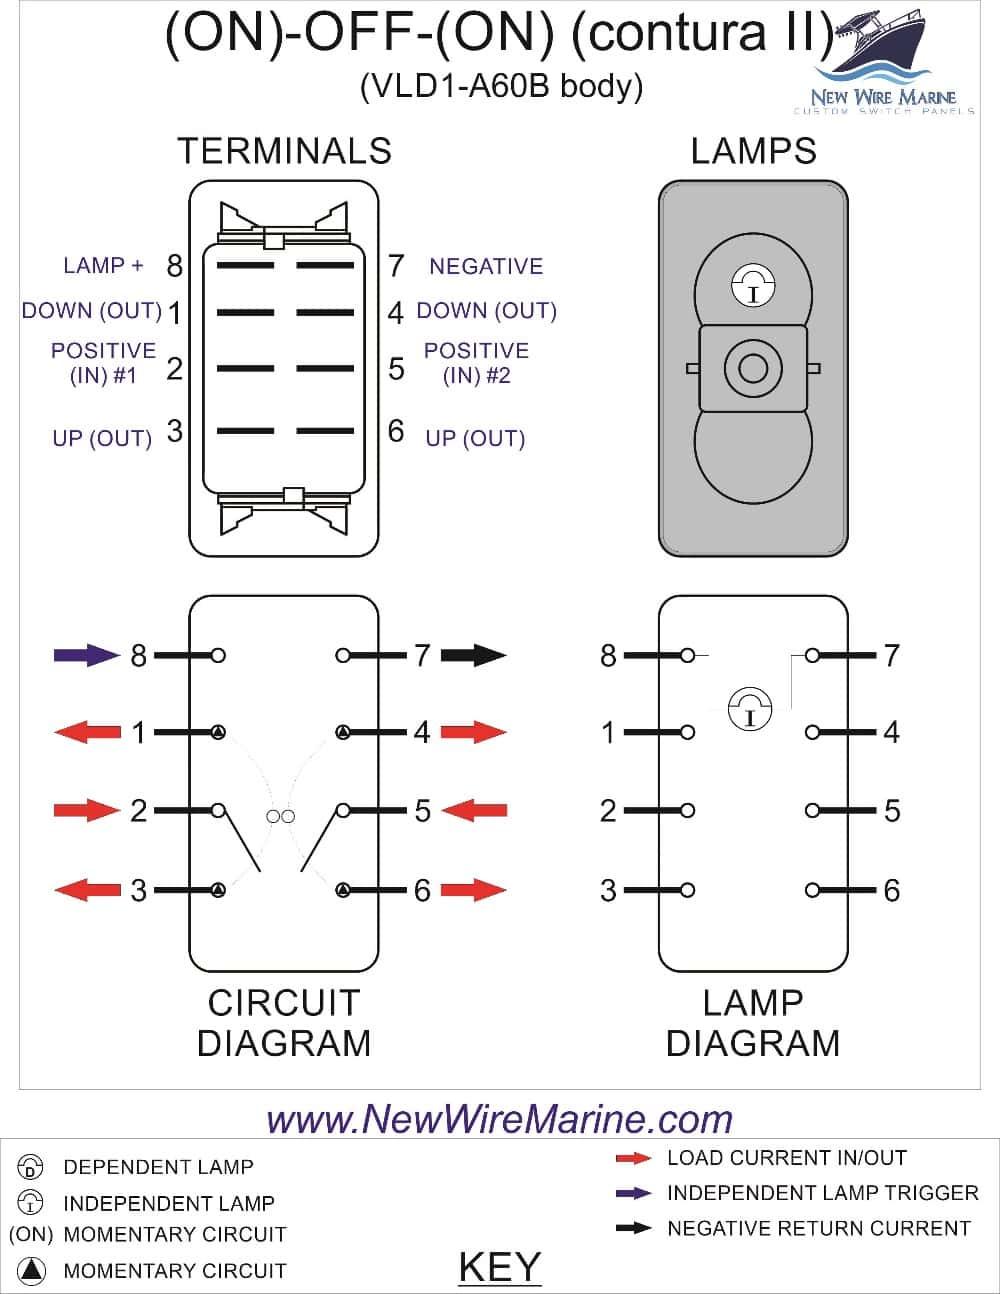 4 Pole Relay Wiring Diagram Wiper - Wiring Diagrams Hubs - 5 Pin Relay Wiring Diagram